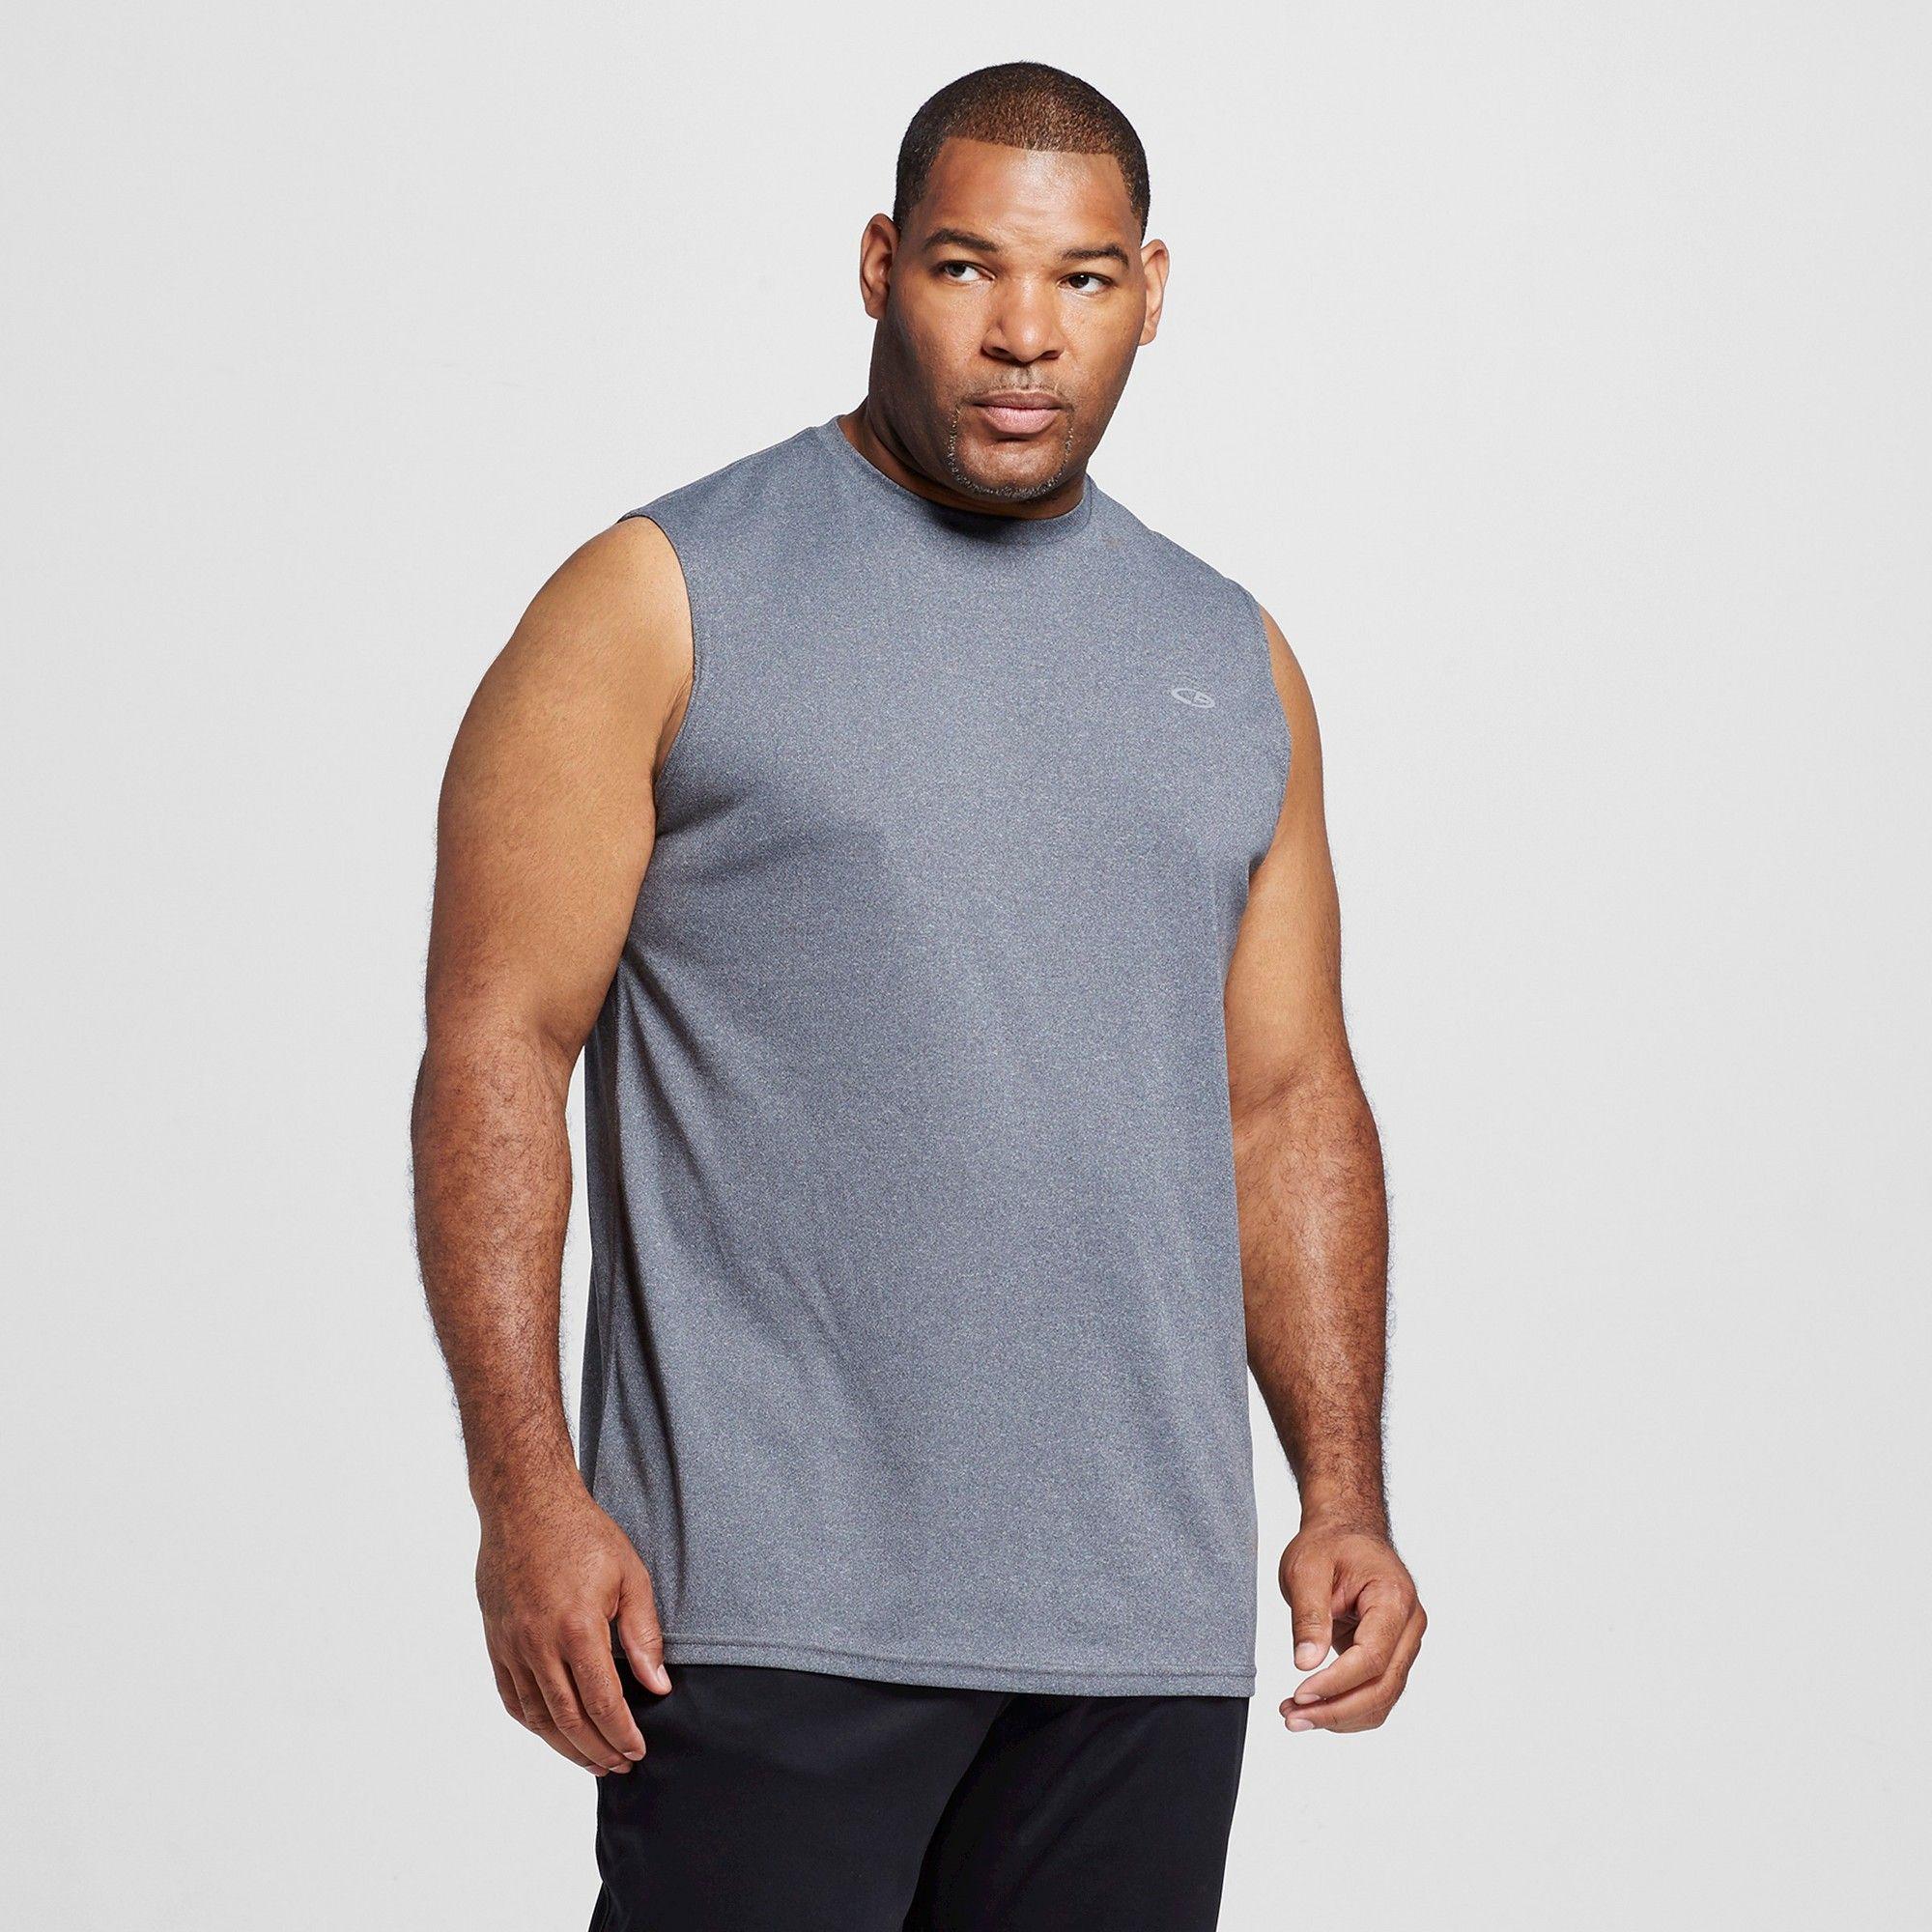 591c9341 Men's Big & Tall Tech Sleeveless Shirt Charcoal Heather Xlt - C9 Champion